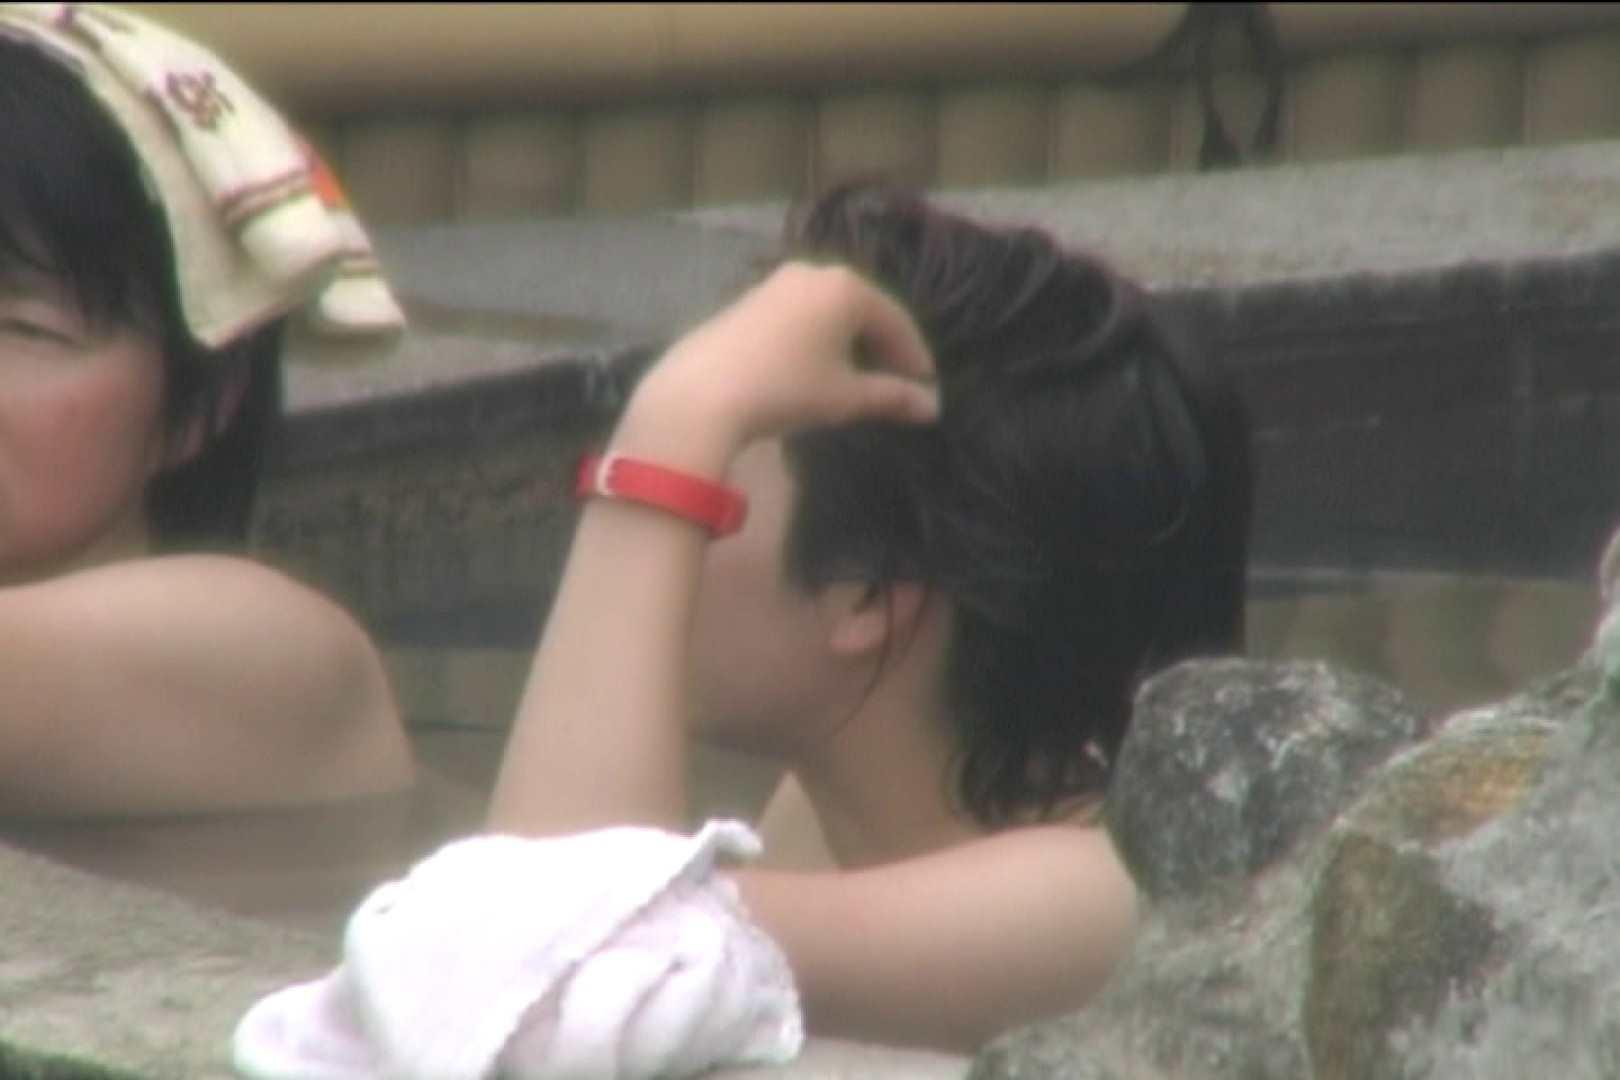 Aquaな露天風呂Vol.122 露天 | OL女体  77連発 70